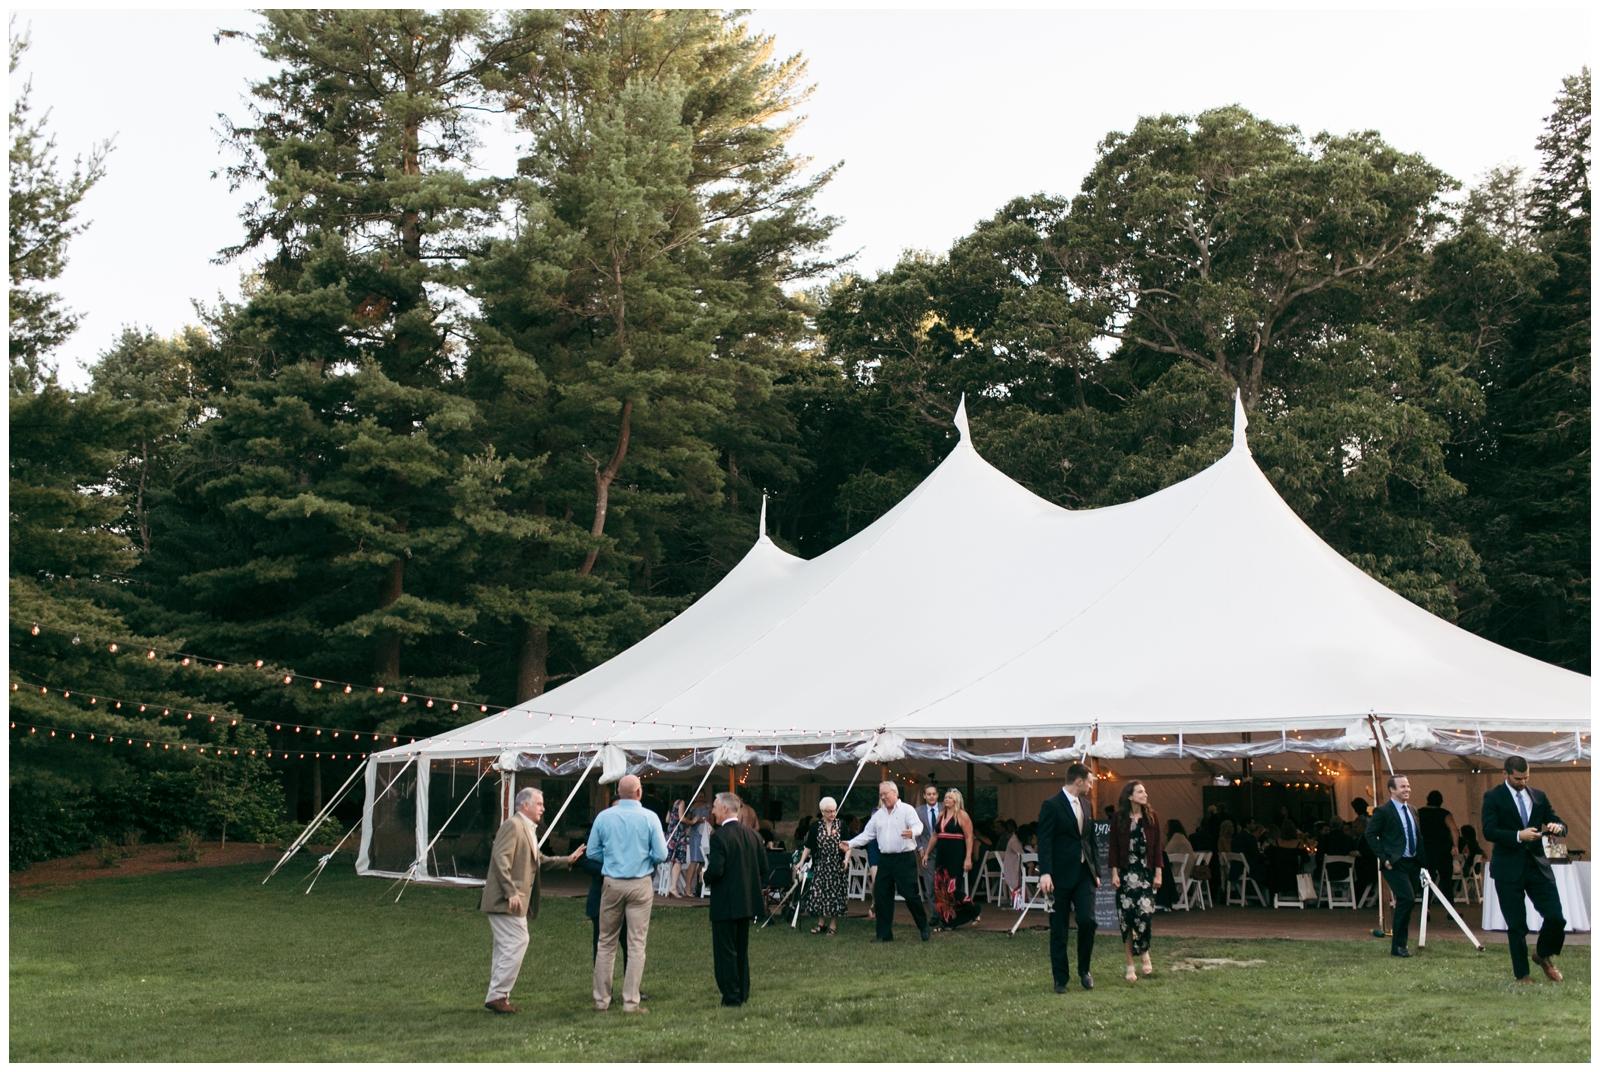 Moraine-Farm-wedding-Bailey-Q-Photo-Massachusetts-wedding-photpgrapher-127.jpg